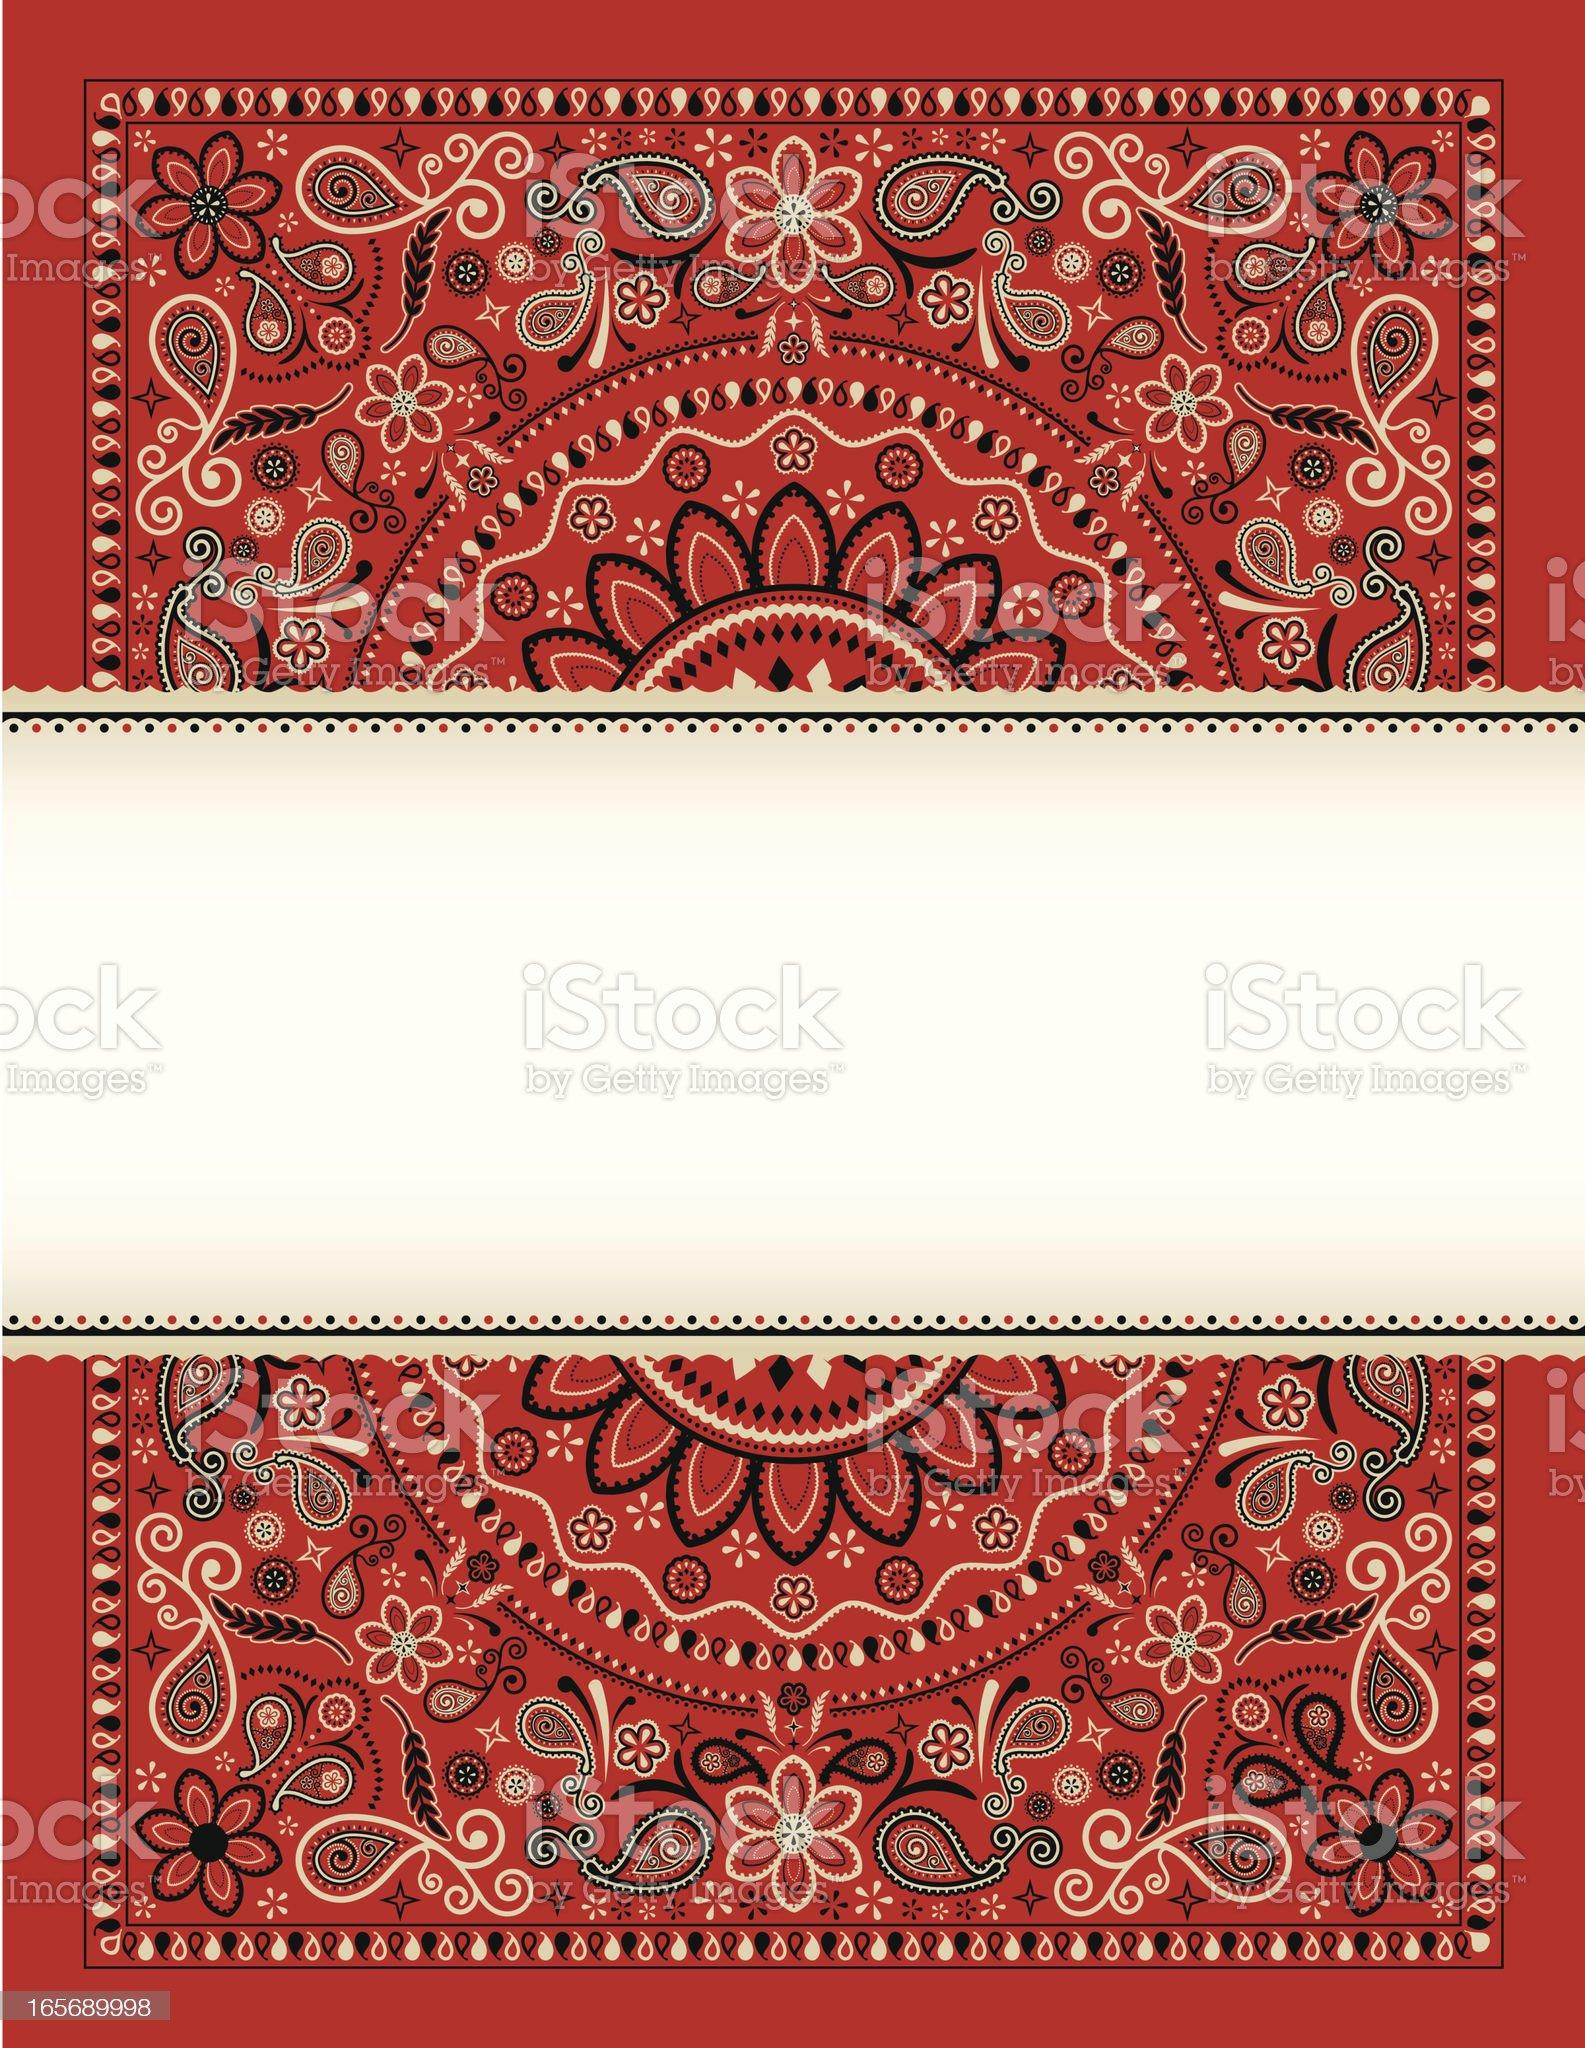 Bandana Banner royalty-free stock vector art